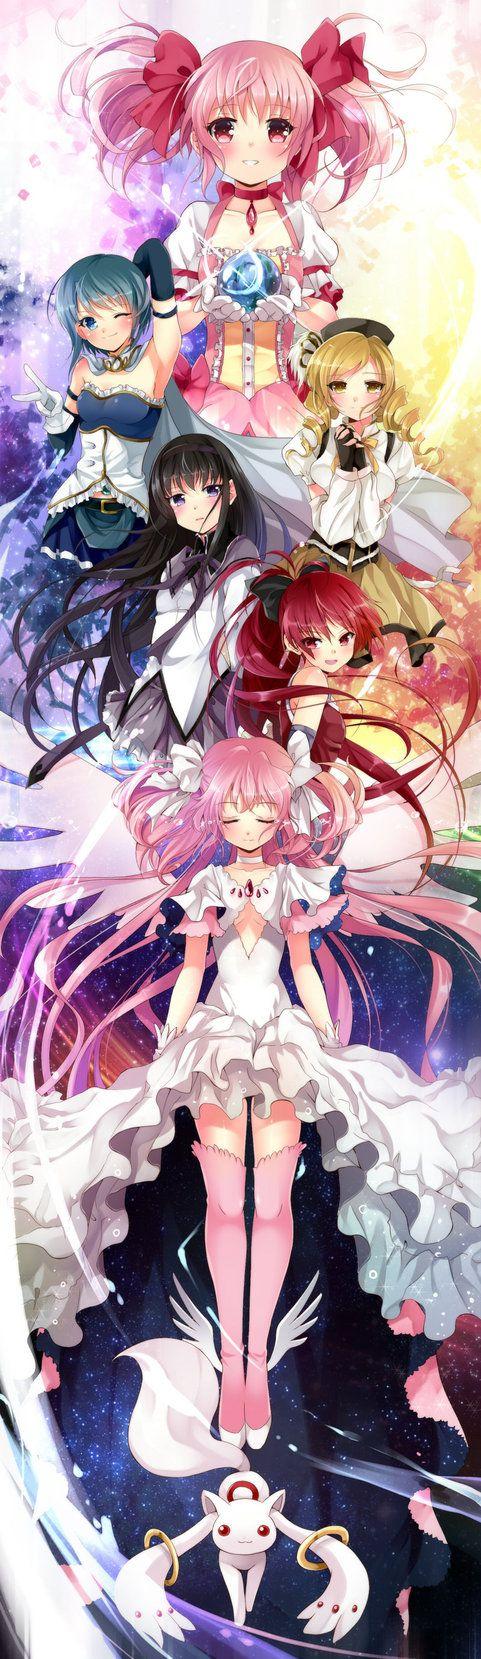 Collabertaion of anime Puella Magi Madoka Magica by Rurutia8 and ninjinshiru on deviantART